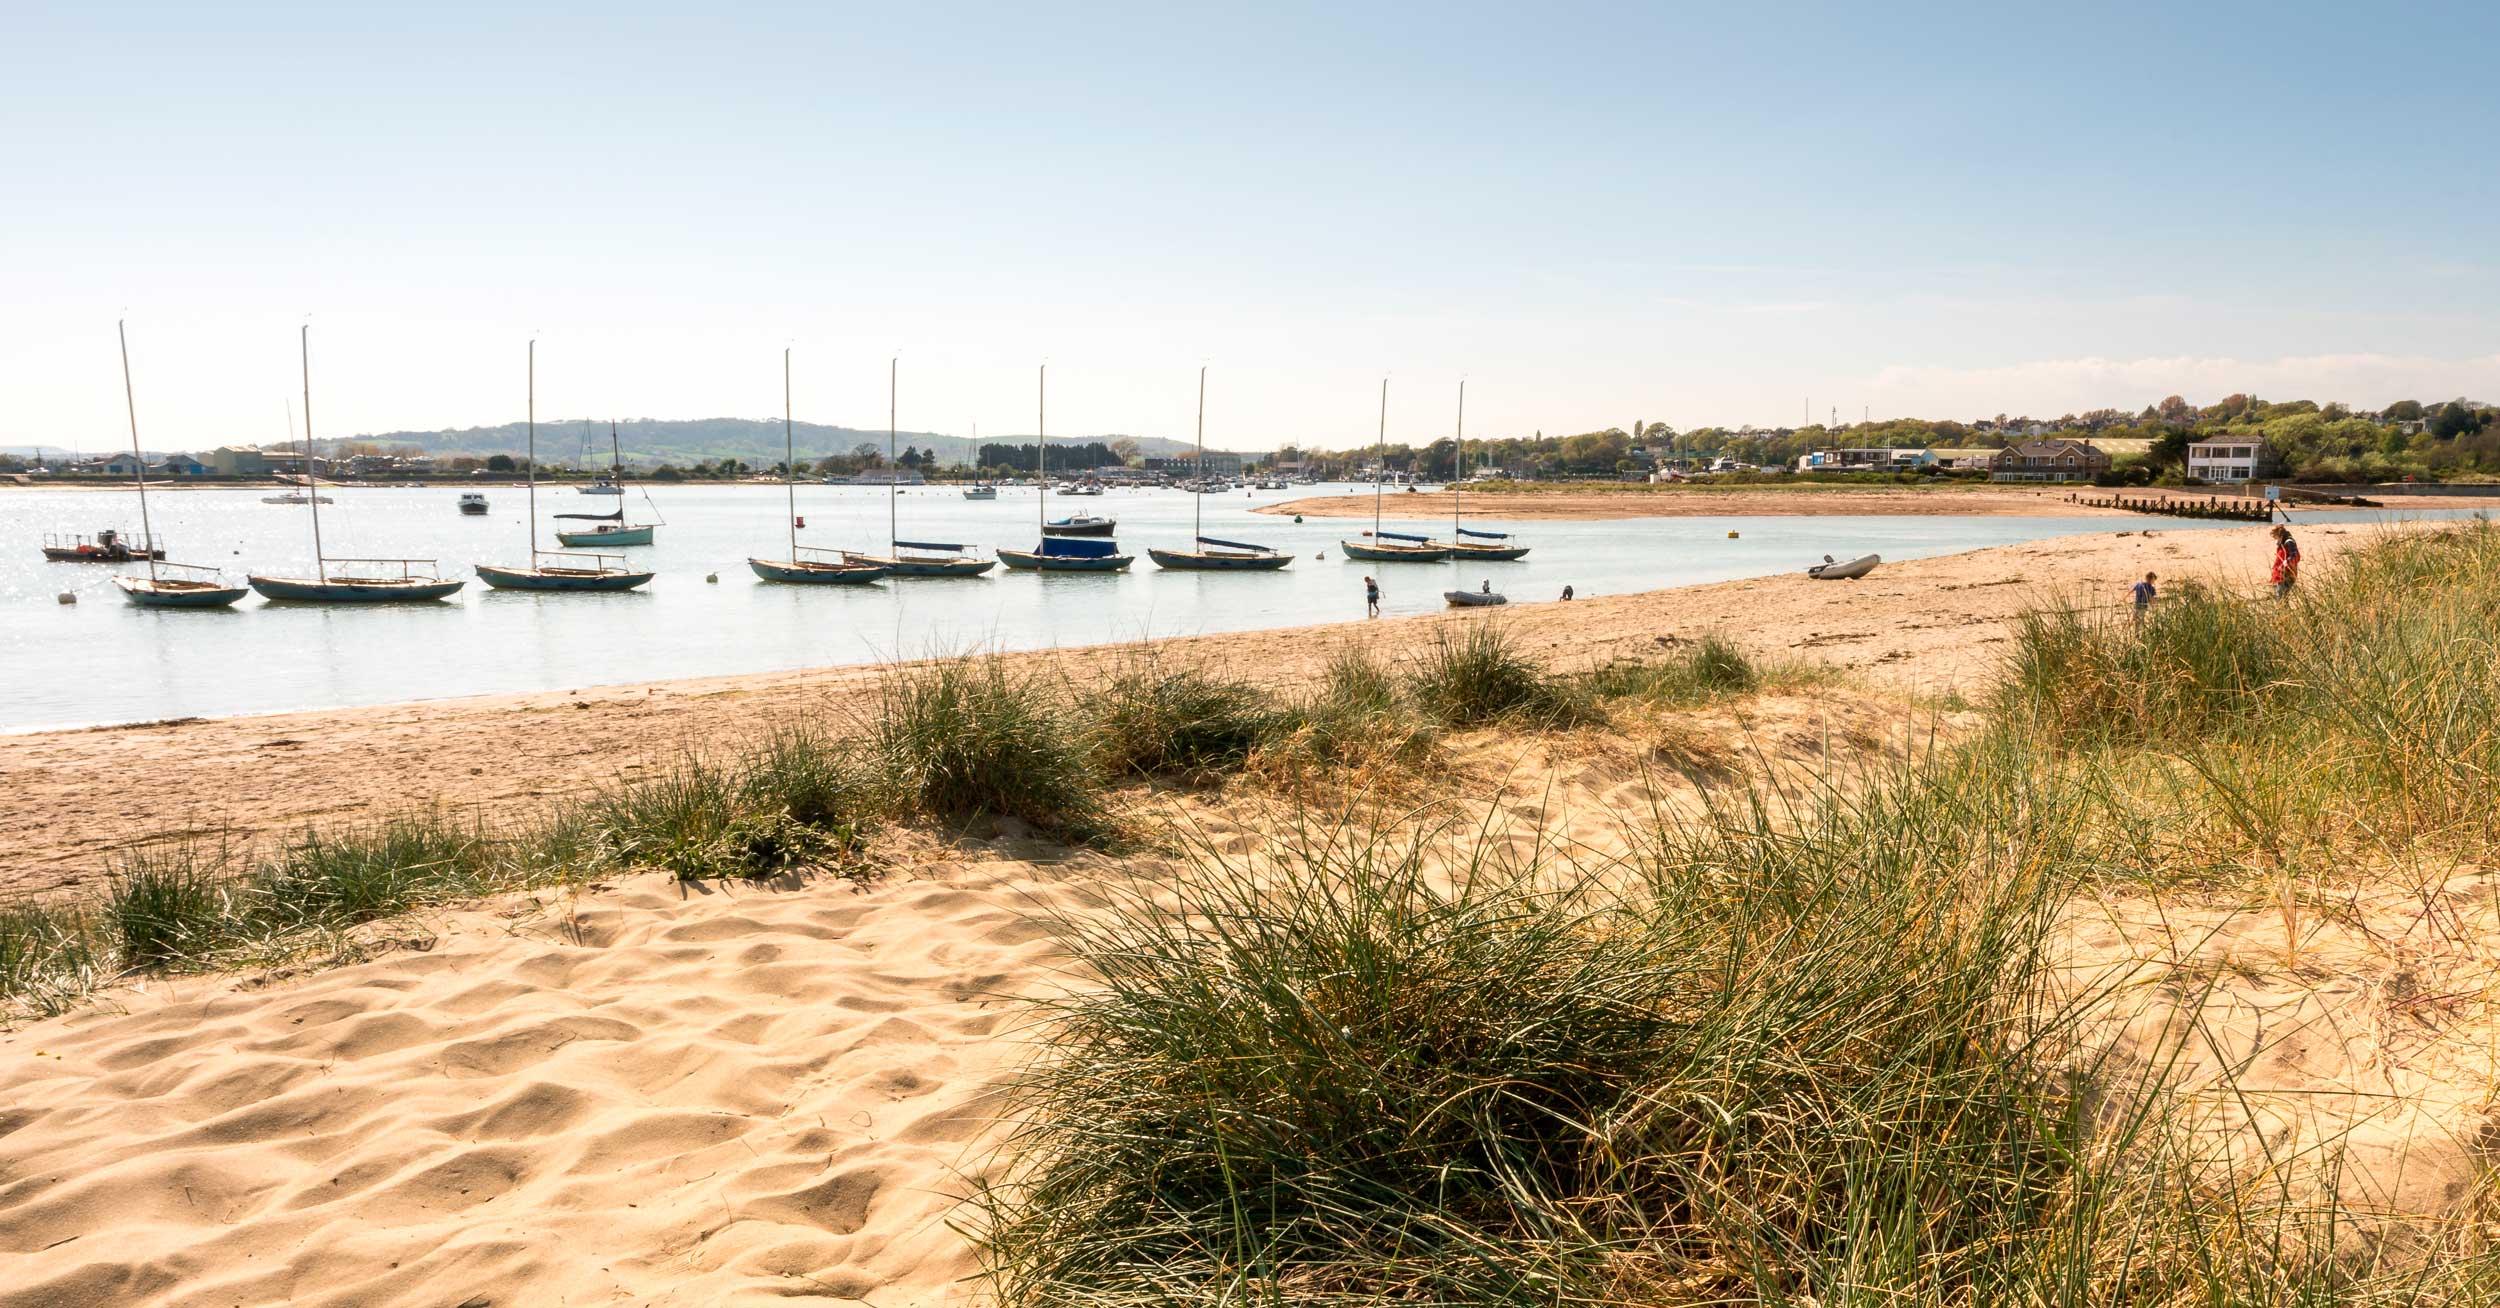 Boats in Benbridge Harbour, Isle of Wight  (Laurence Baker/Shutterstock)